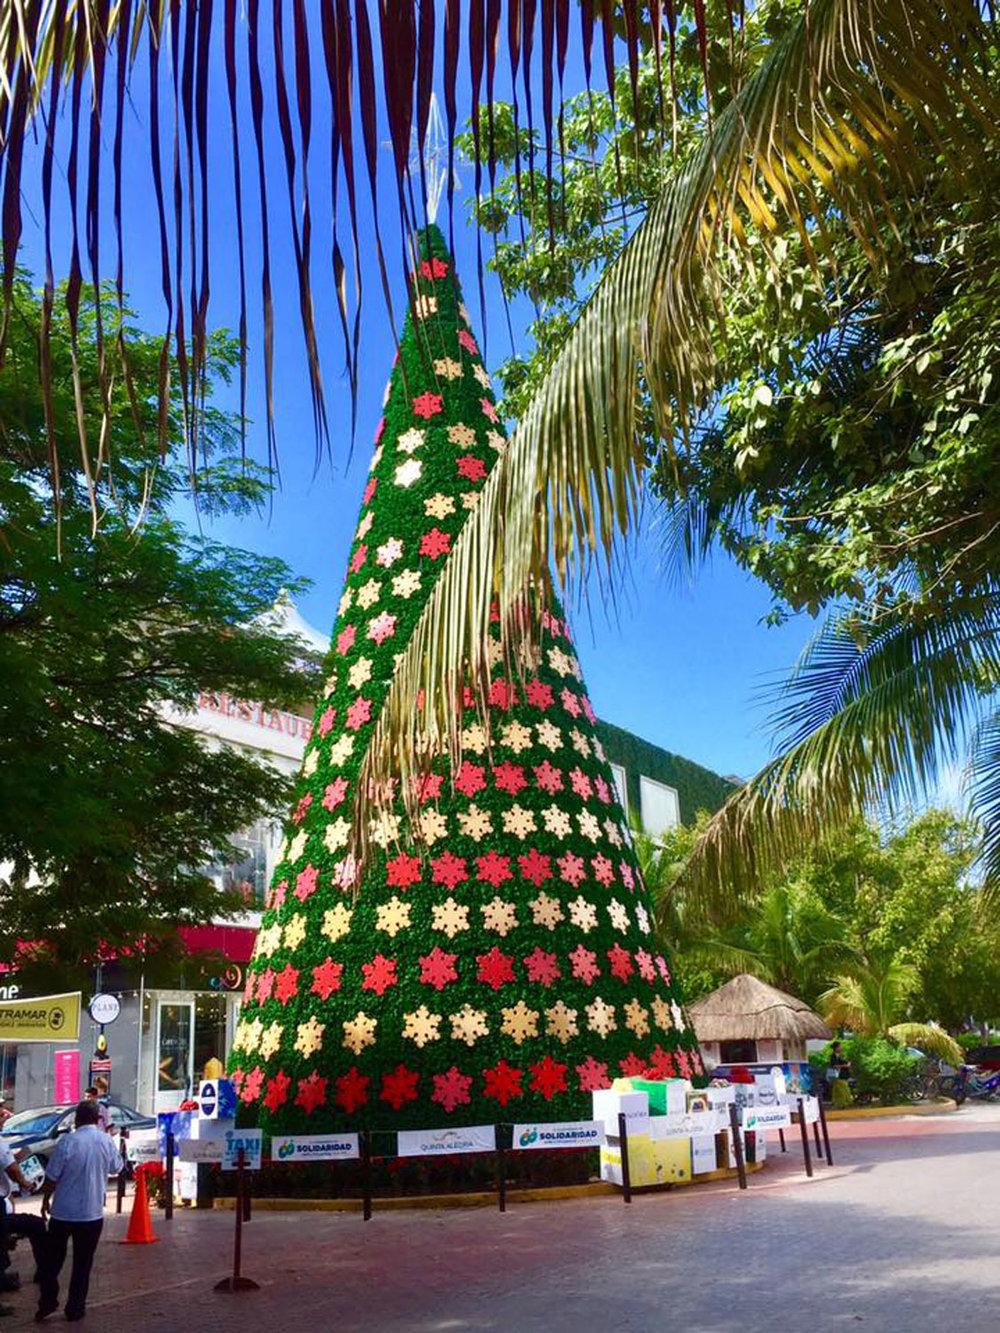 Hammocks_and_Ruins_Blog_Riviera_Maya_Mexico_Travel_Discover_Explore_What_to_do_Playa_del_Carmen_14.jpg